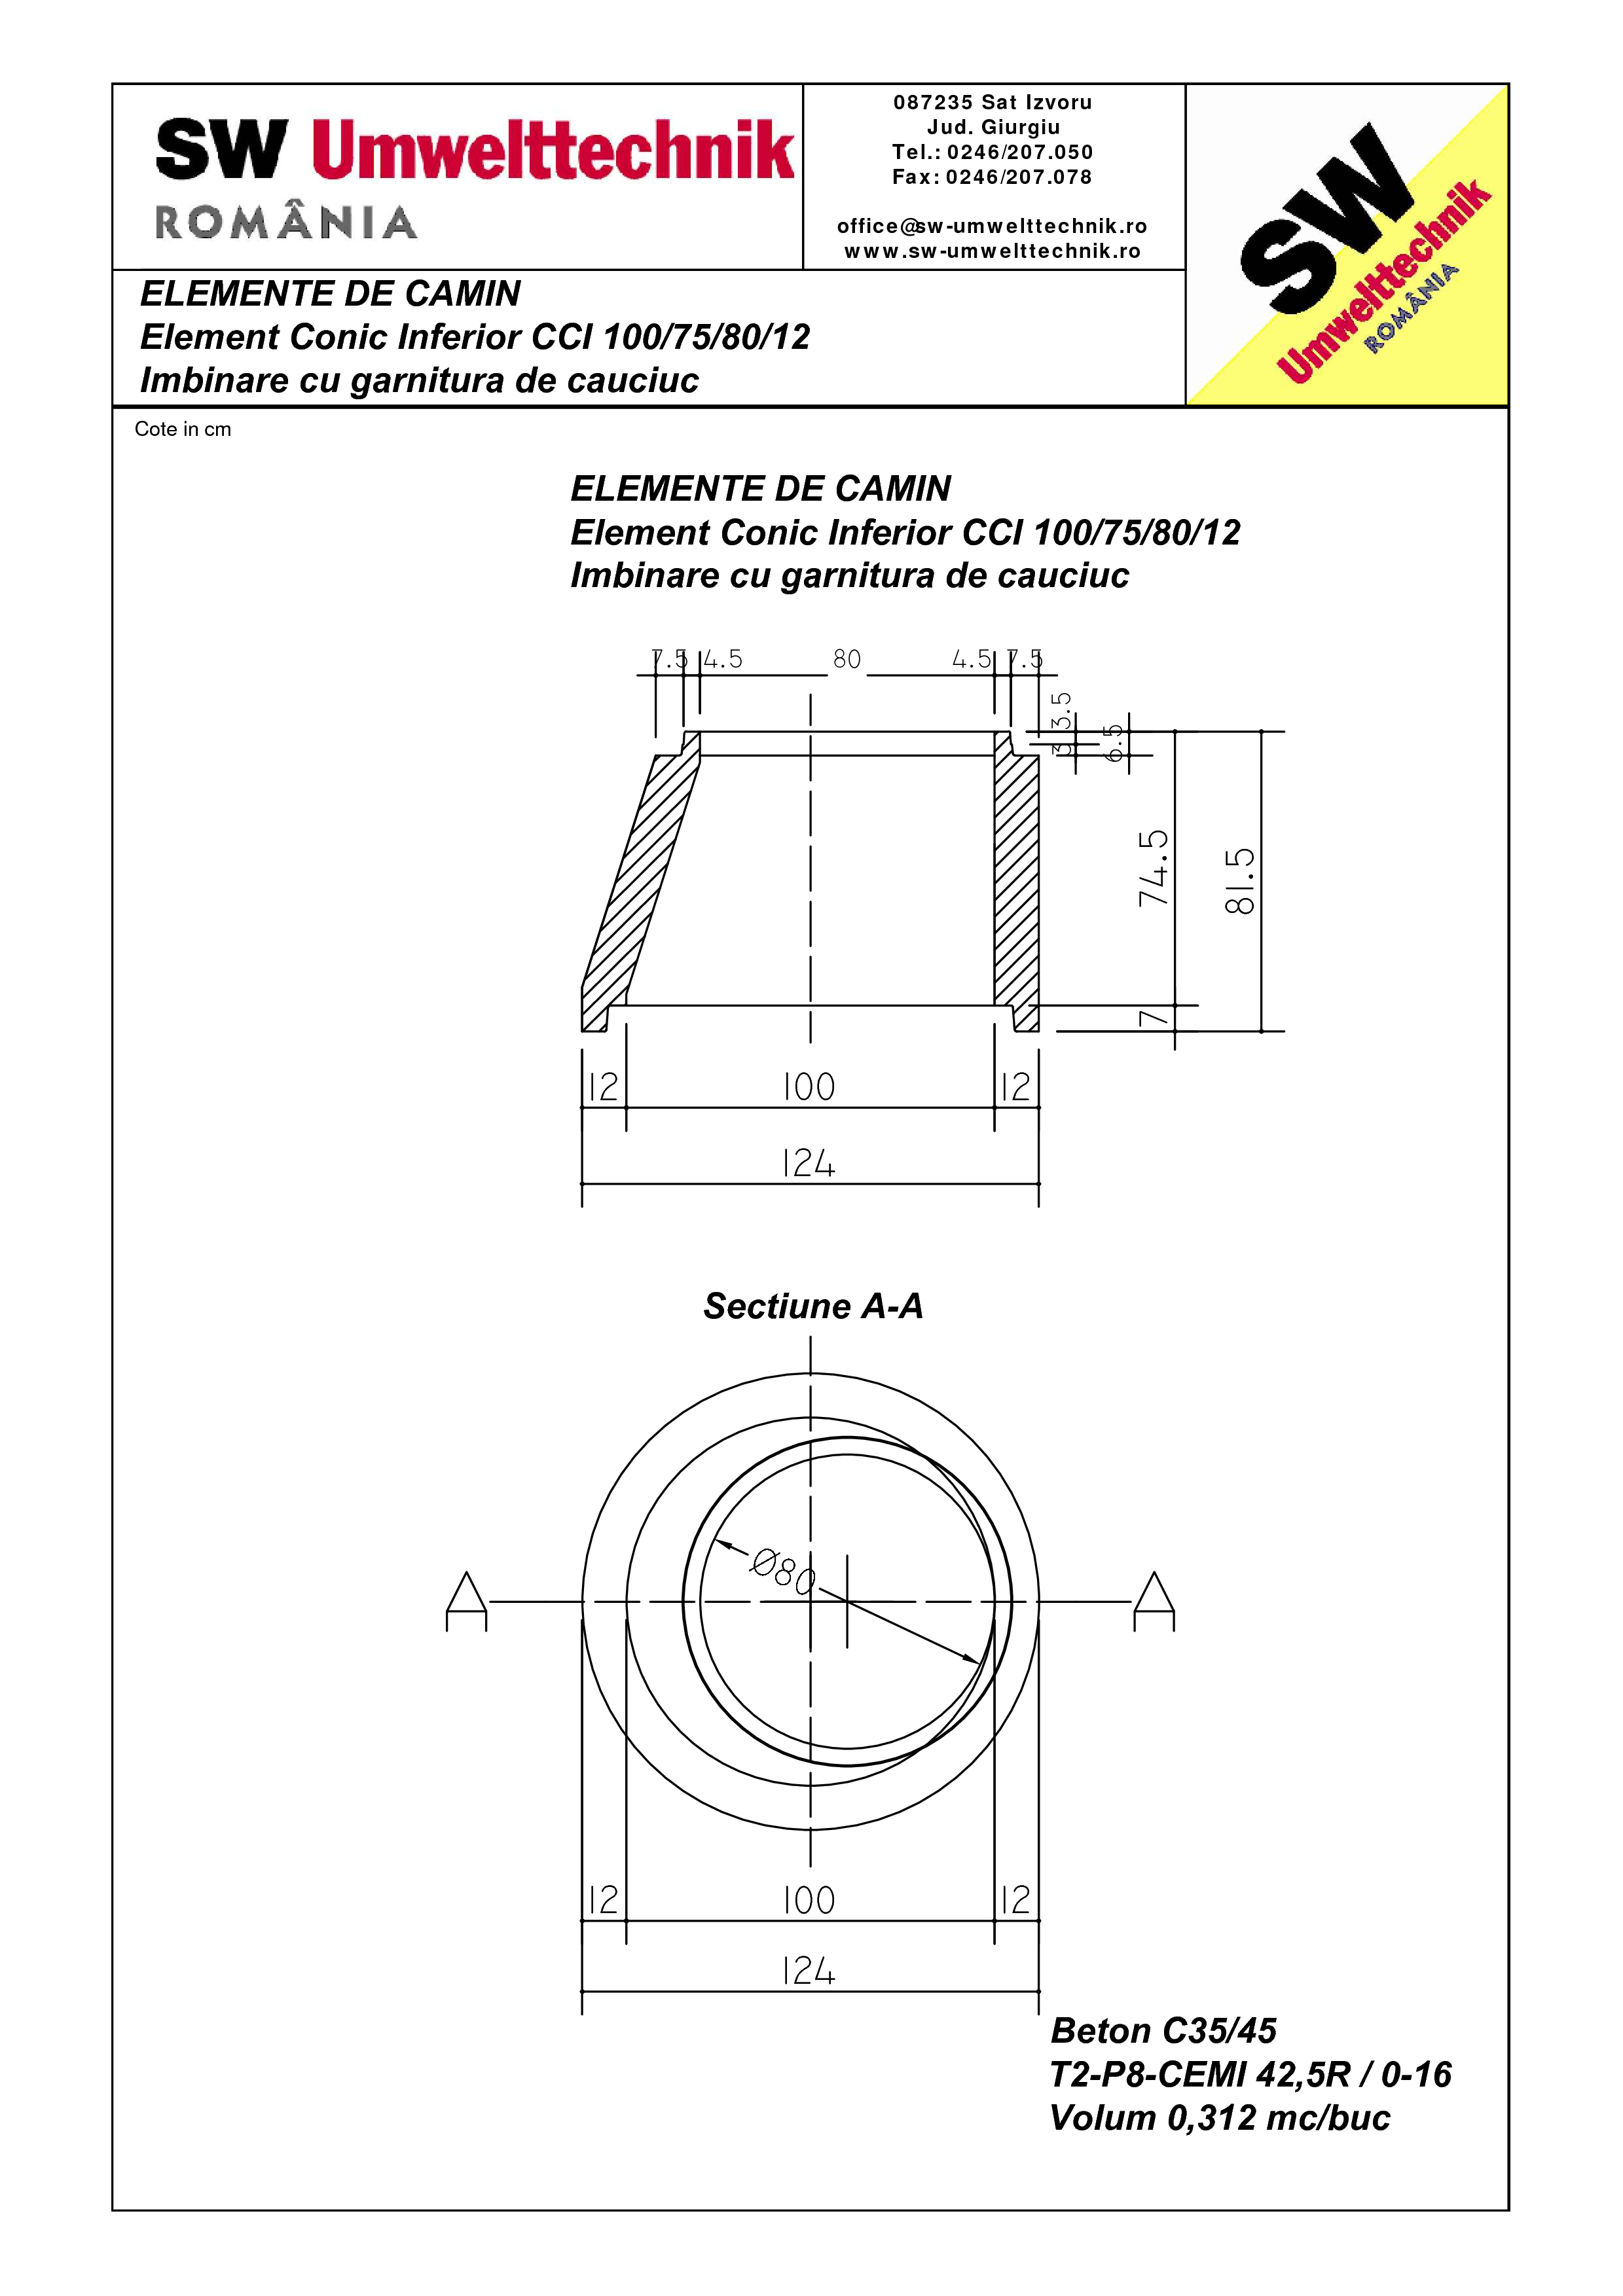 Pagina 1 - CAD-PDF Element conic superior CCI 100.75.80.12 SW UMWELTTECHNIK Detaliu de produs